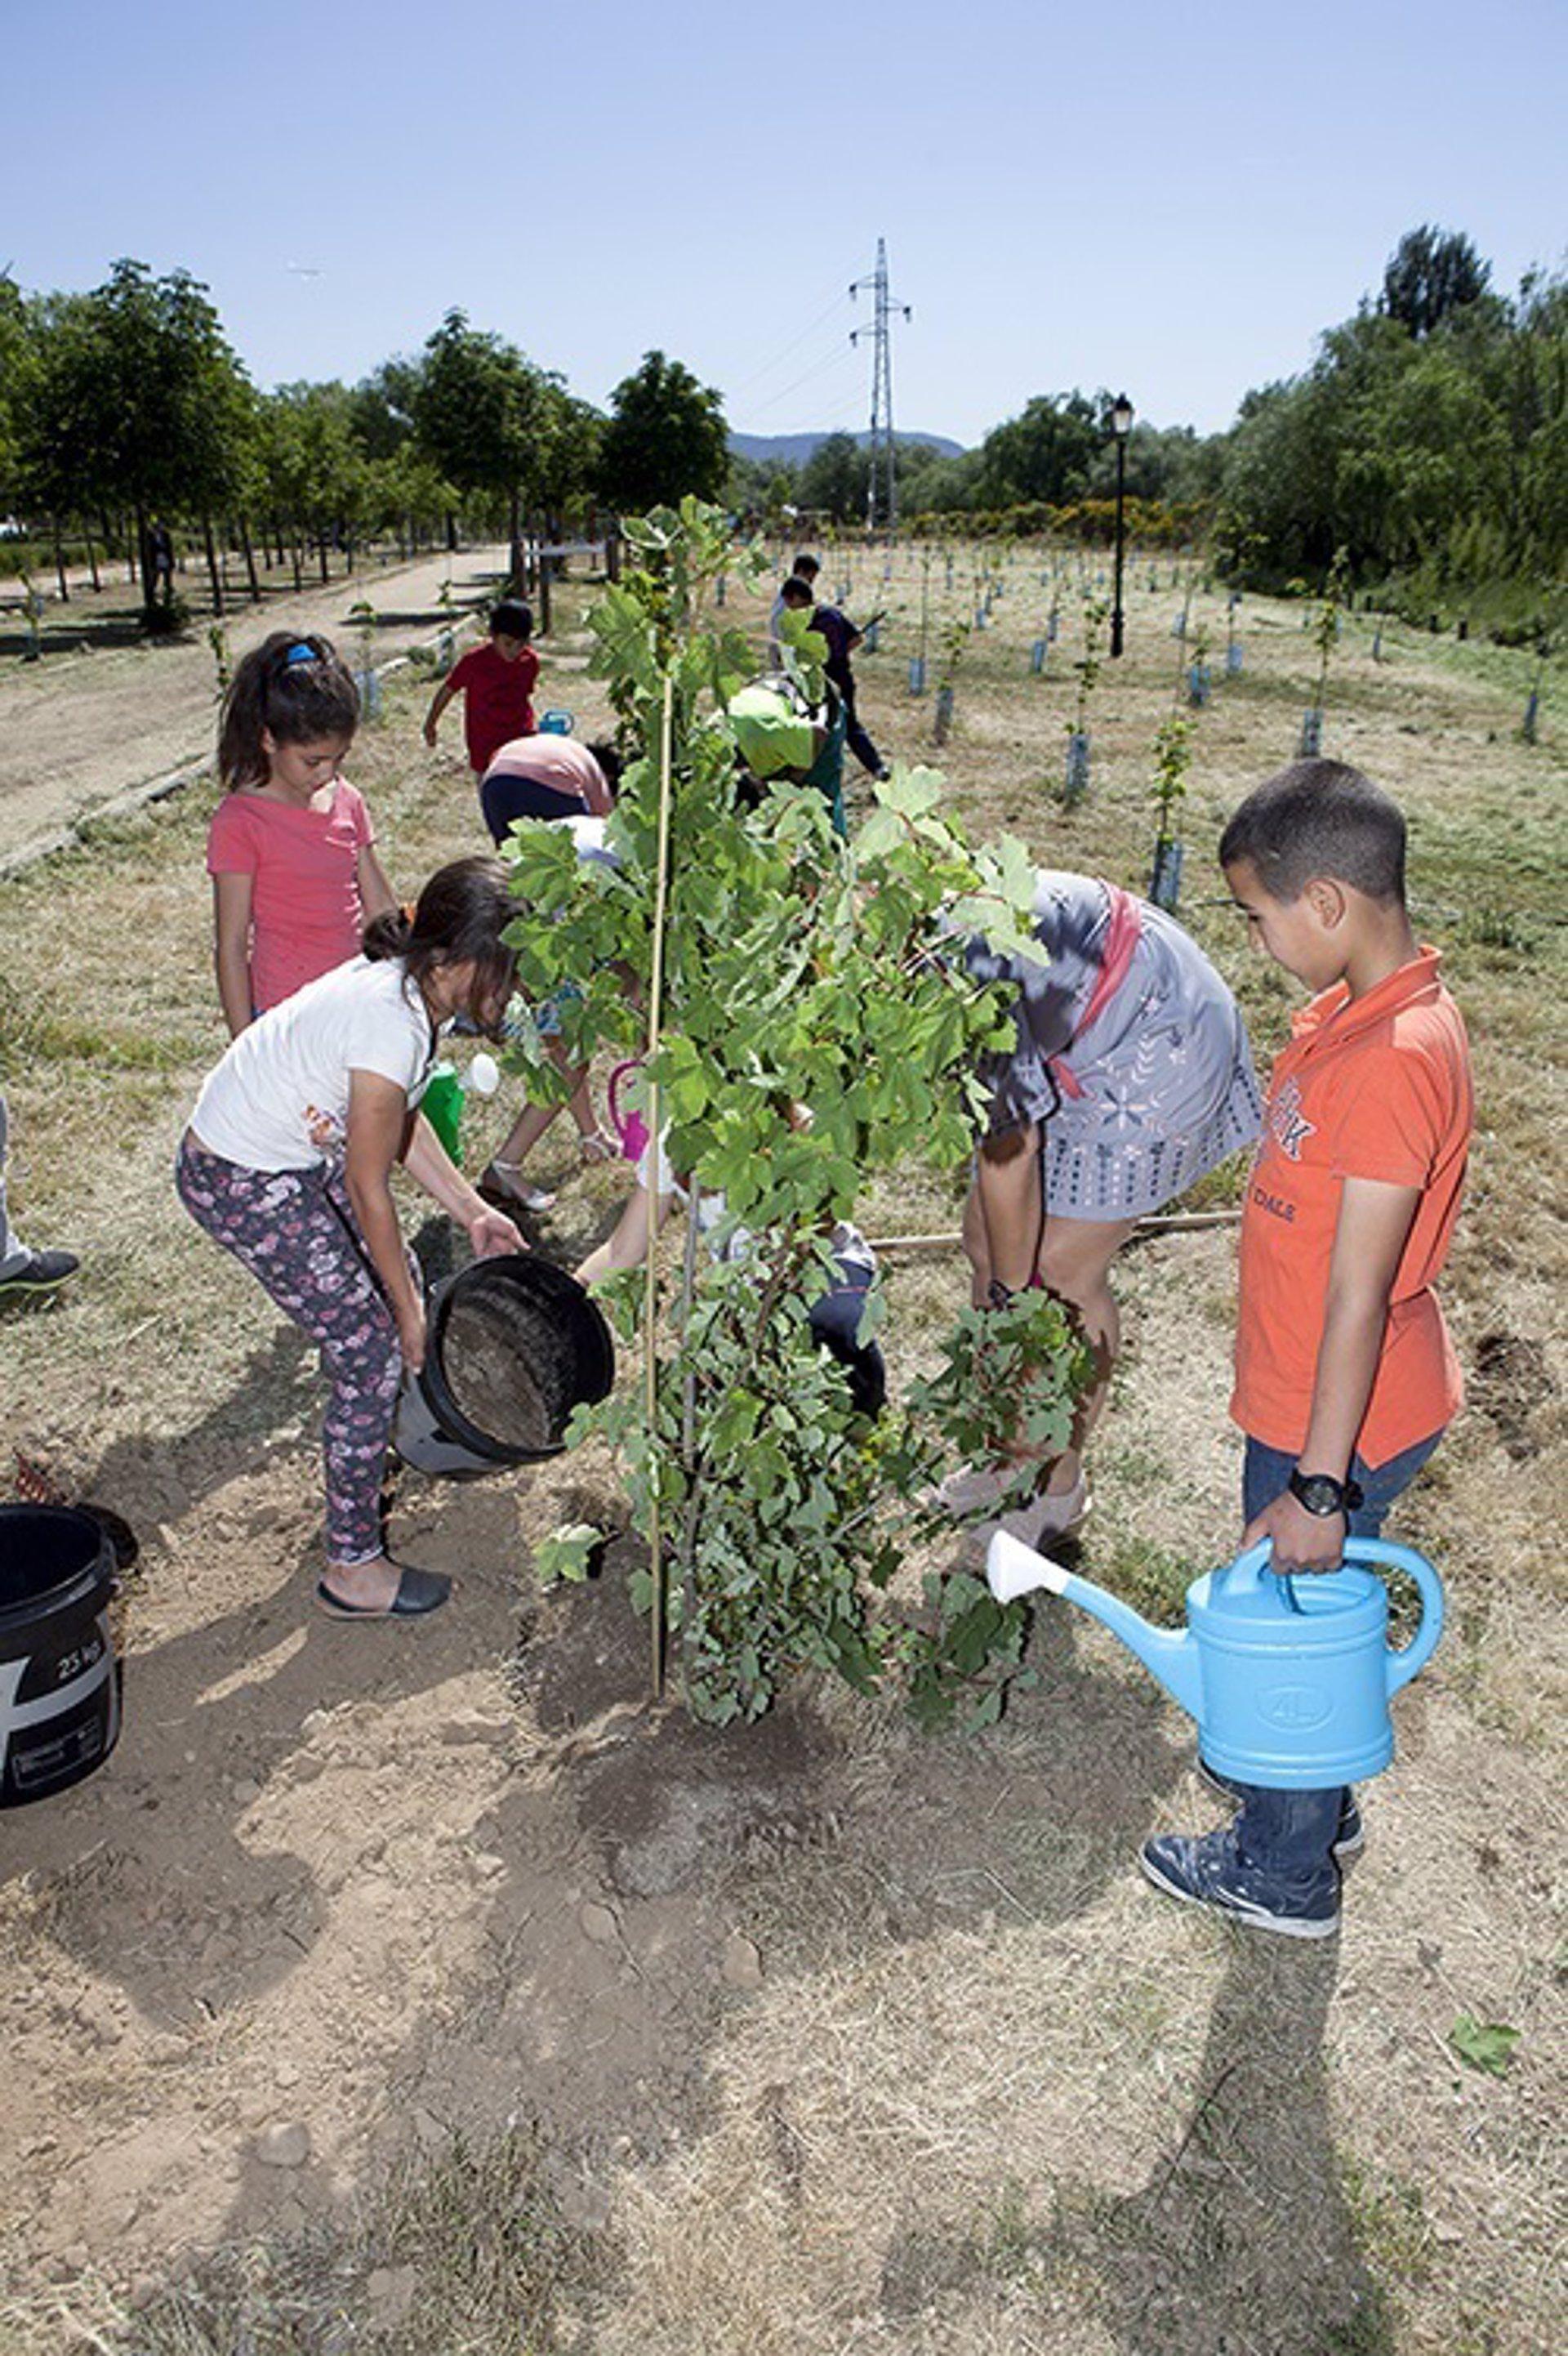 Plantan rboles en dos zonas verdes de villalba for Calle prado manzano collado villalba